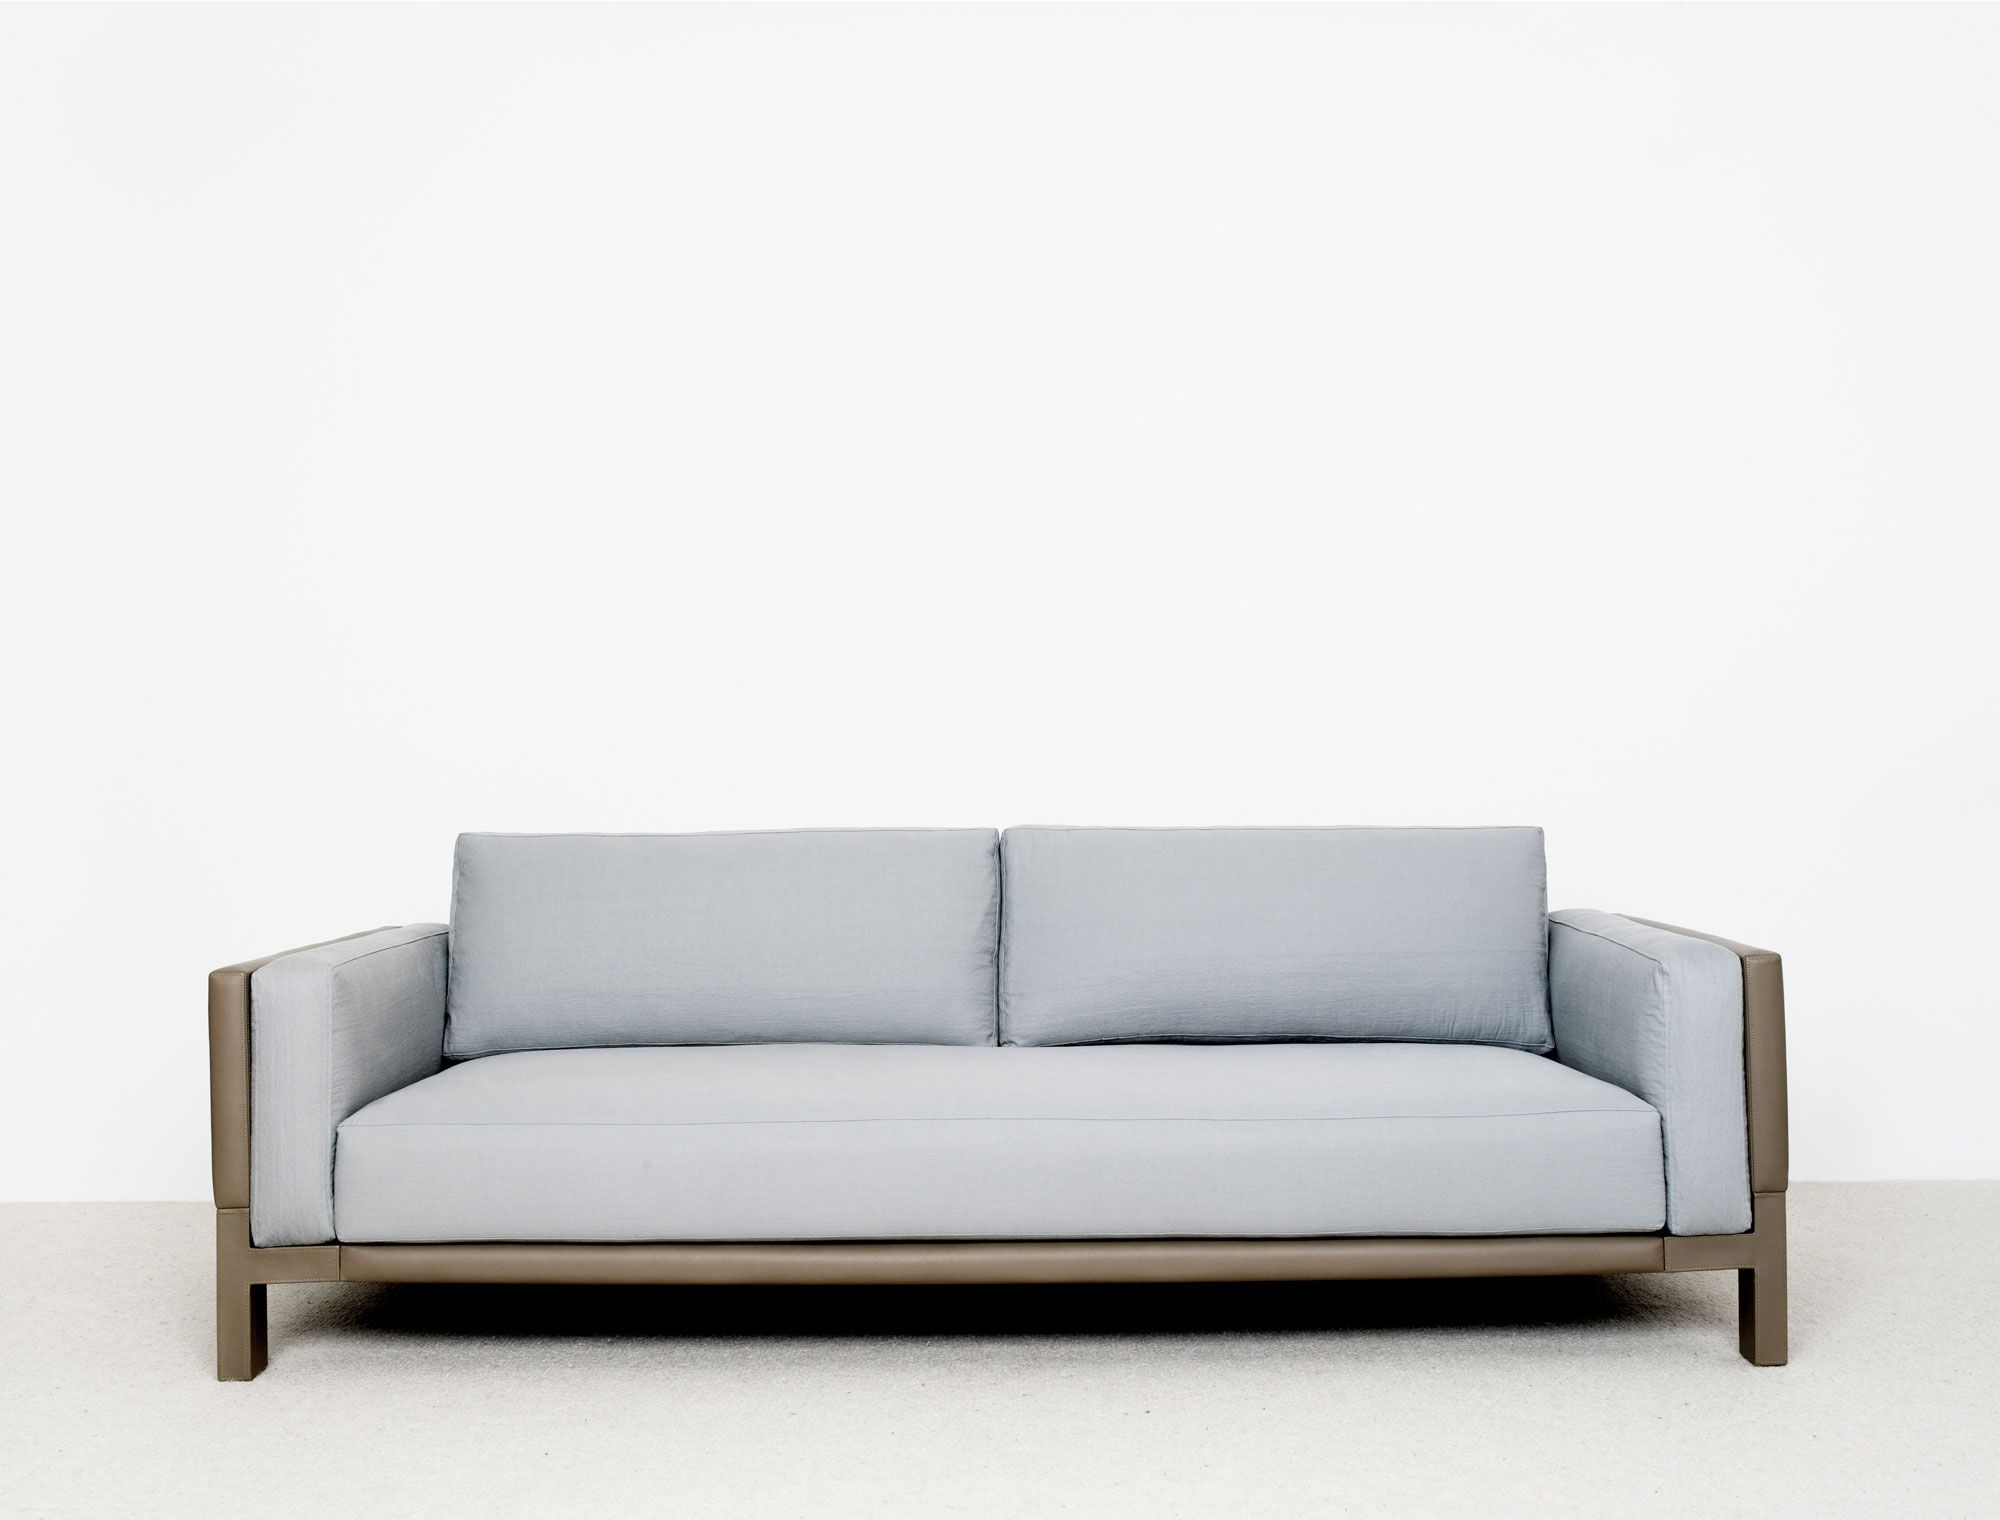 bob sofa christophe delcourt inflatable camping argos canape noe 2 living room